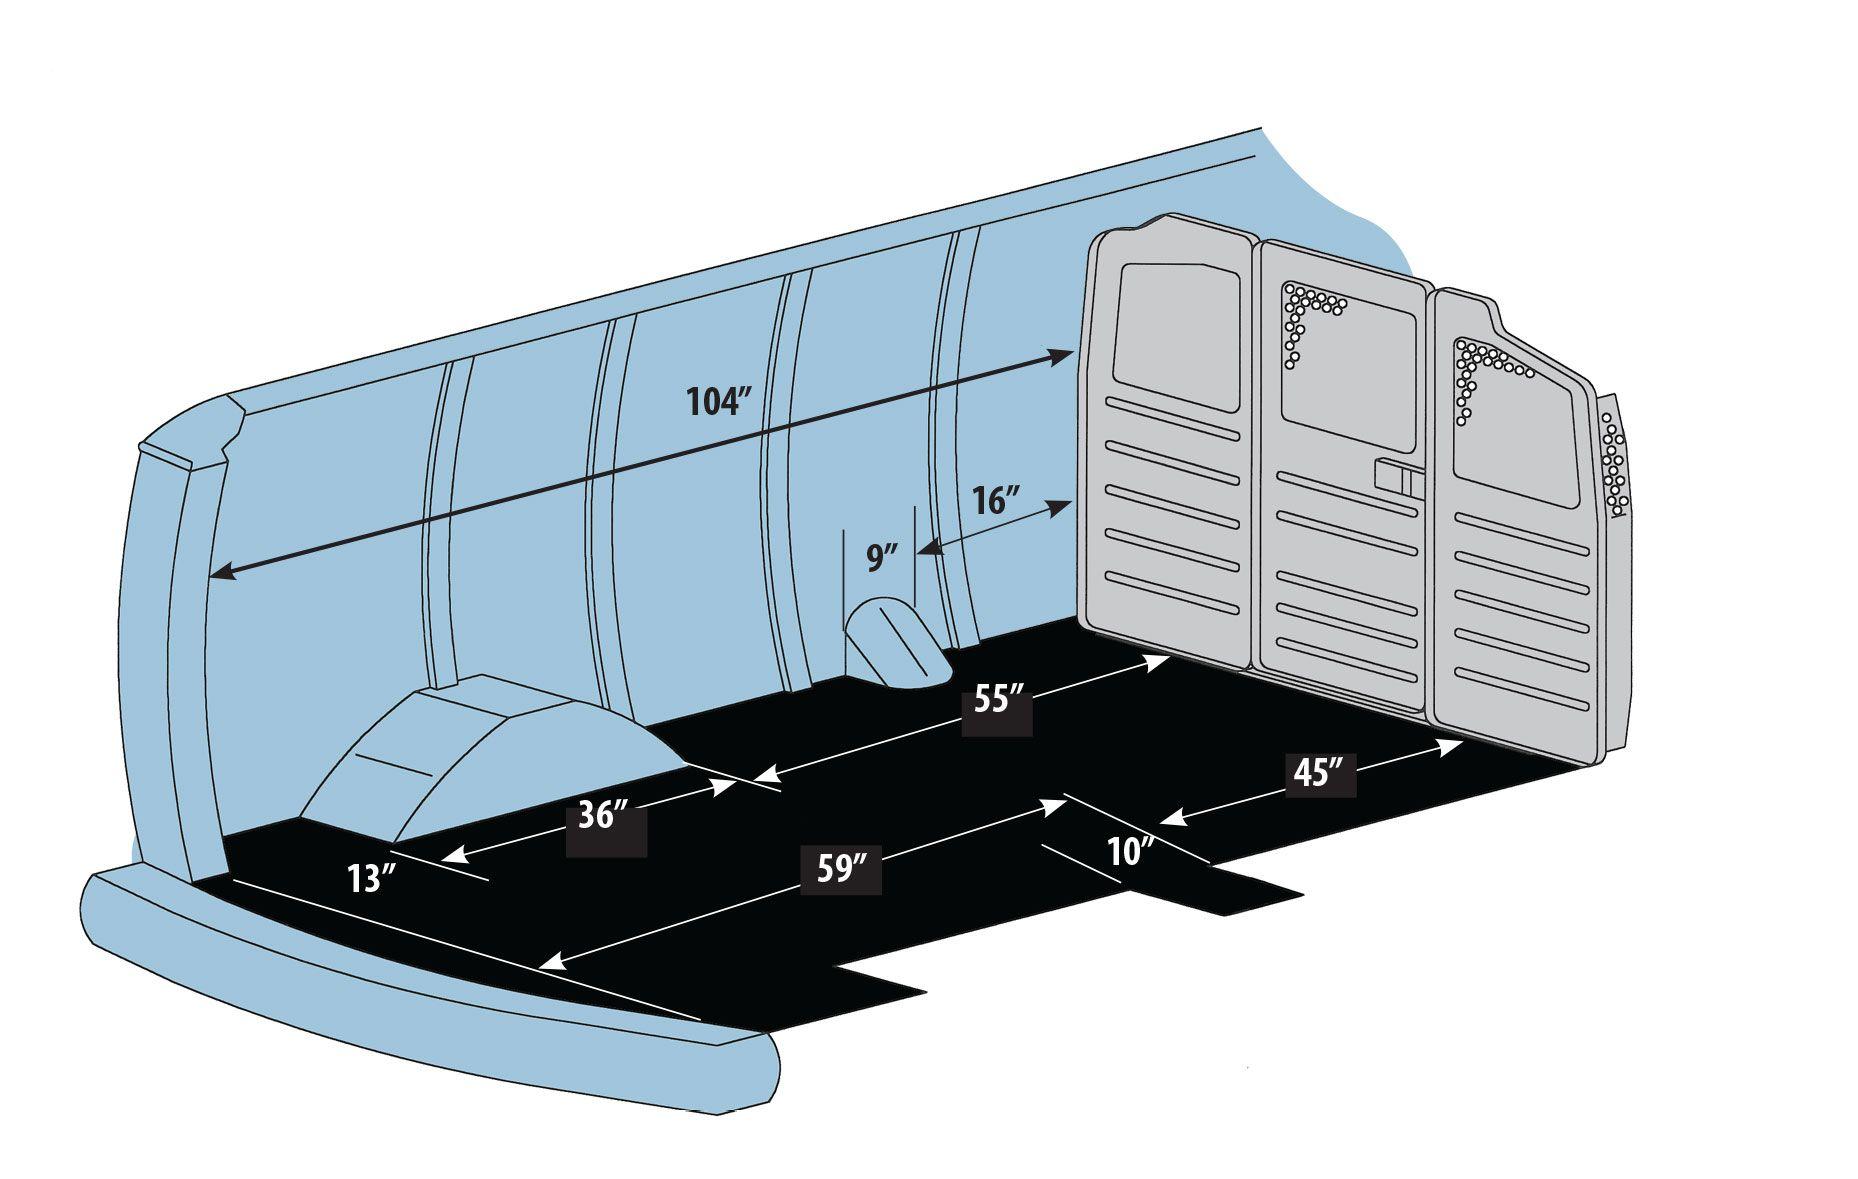 Ford Transit 250 Cargo Van Interior Dimensions - Cargo Van ...